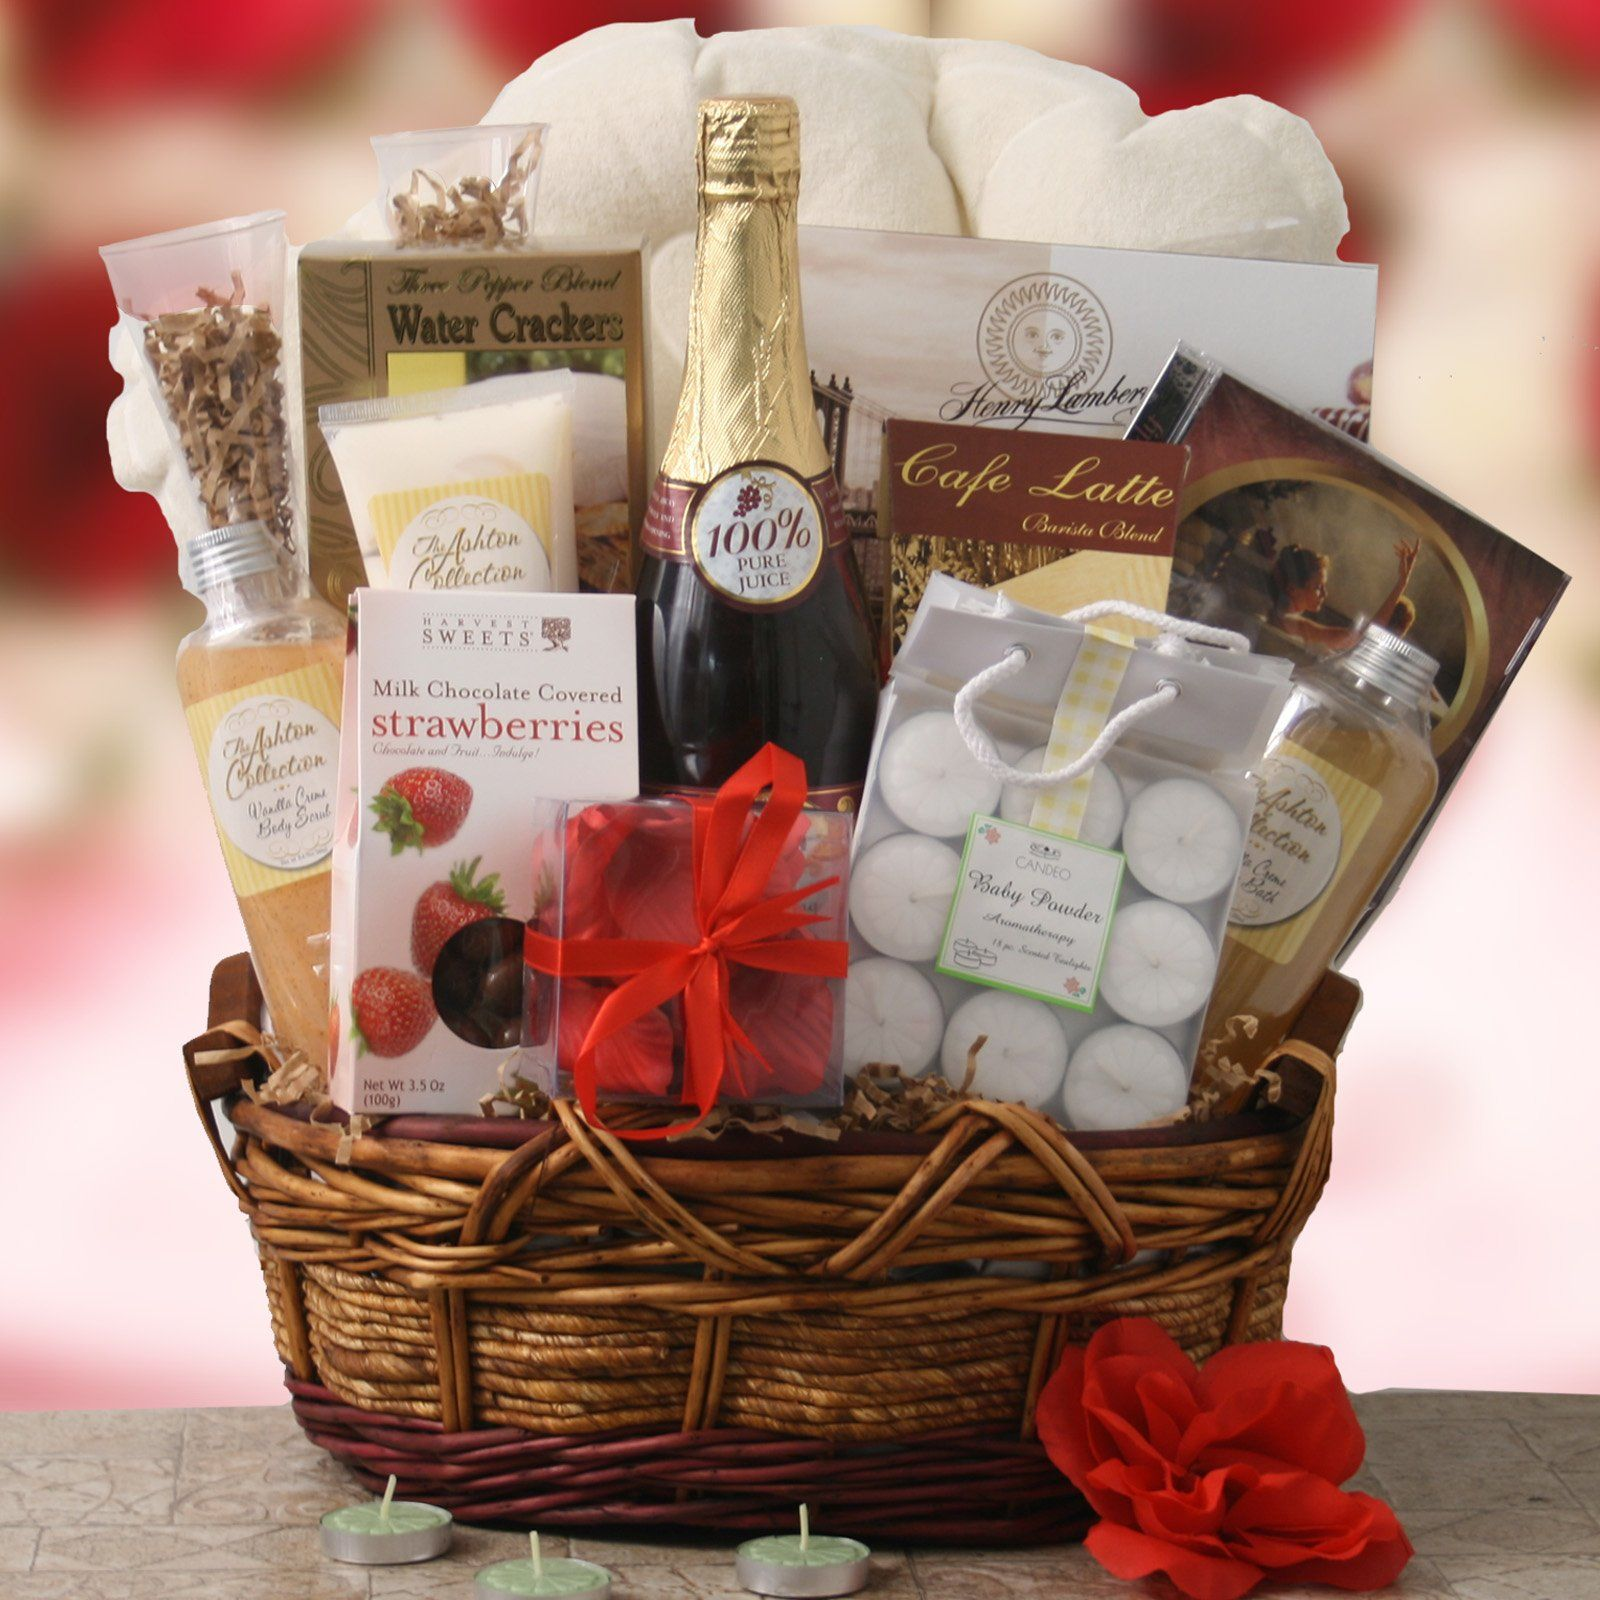 Wedding Gift Basket Ideas: Honeymoon Gift Basket Ideas